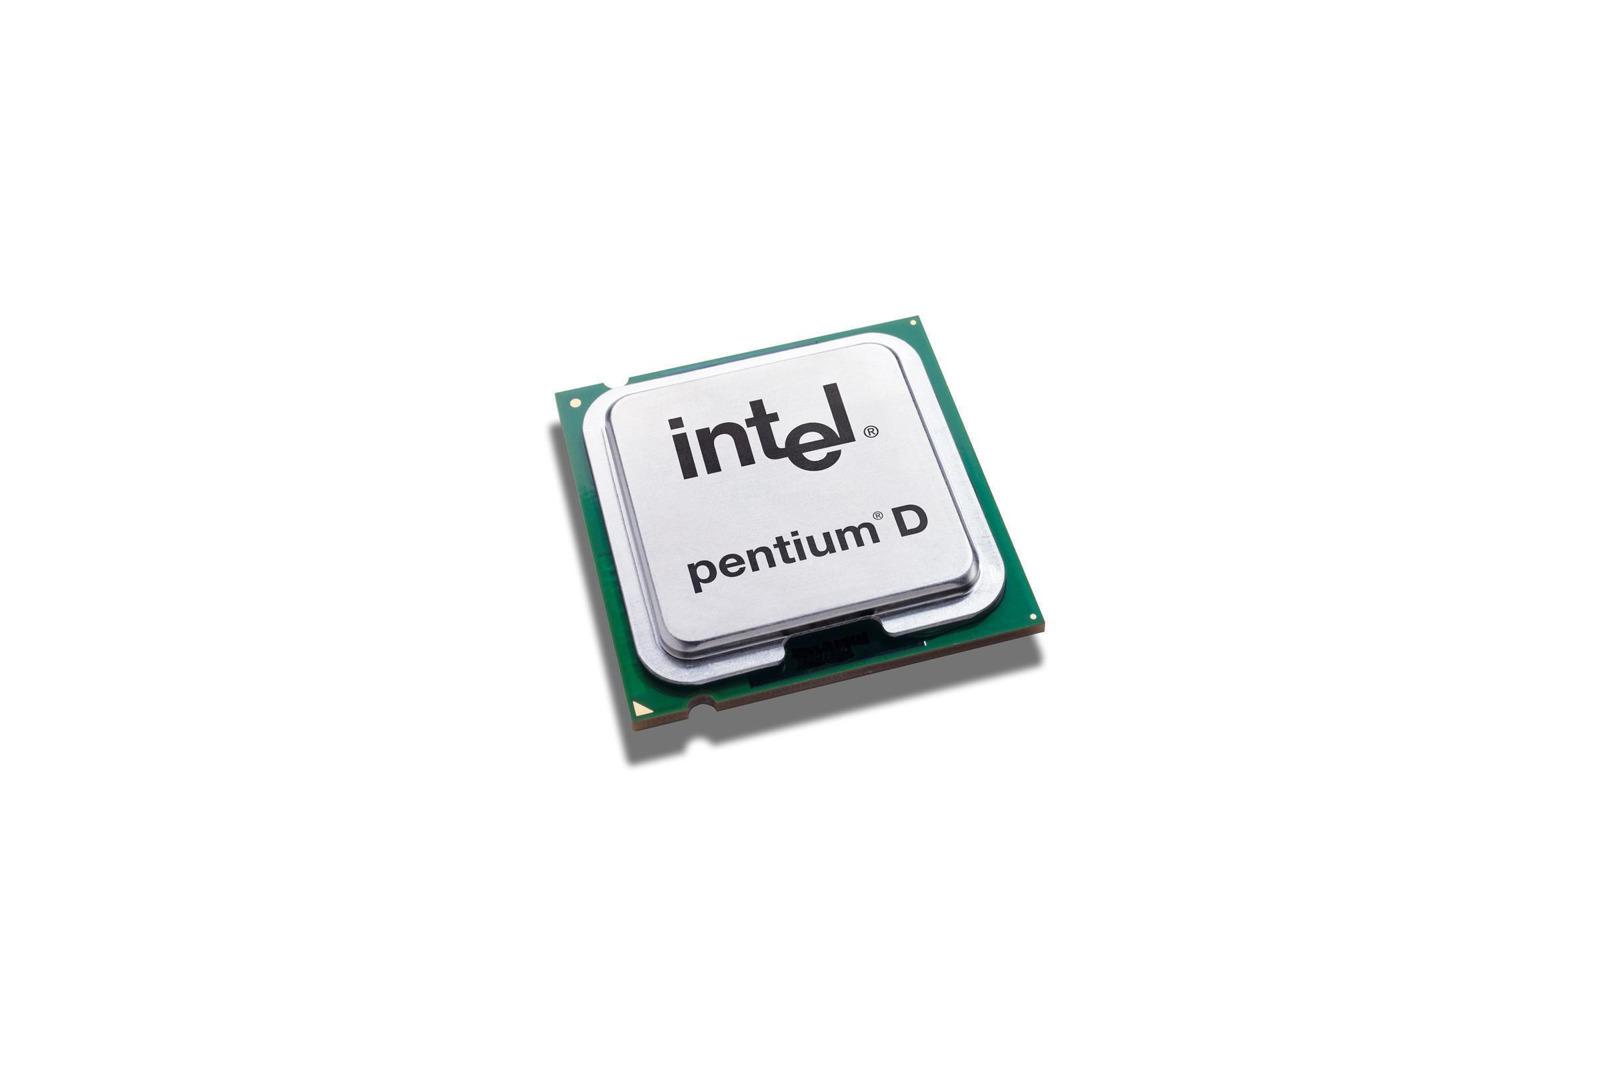 Procesor Intel Pentium D 820 2.8GHz